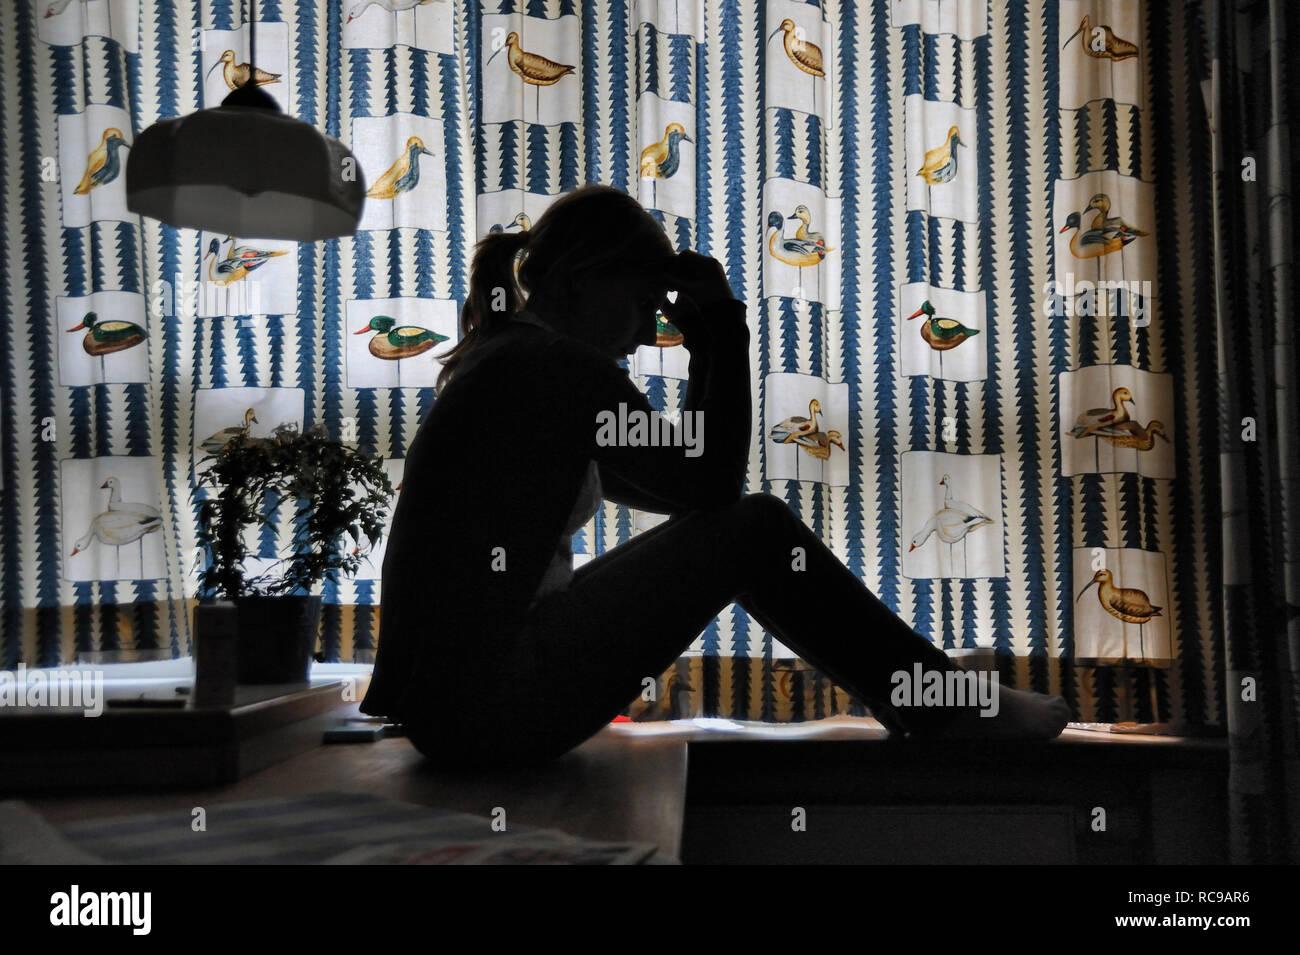 Frau Junge, nachdenklich   joven thoughtfull Silhouette Silhouette Foto de stock